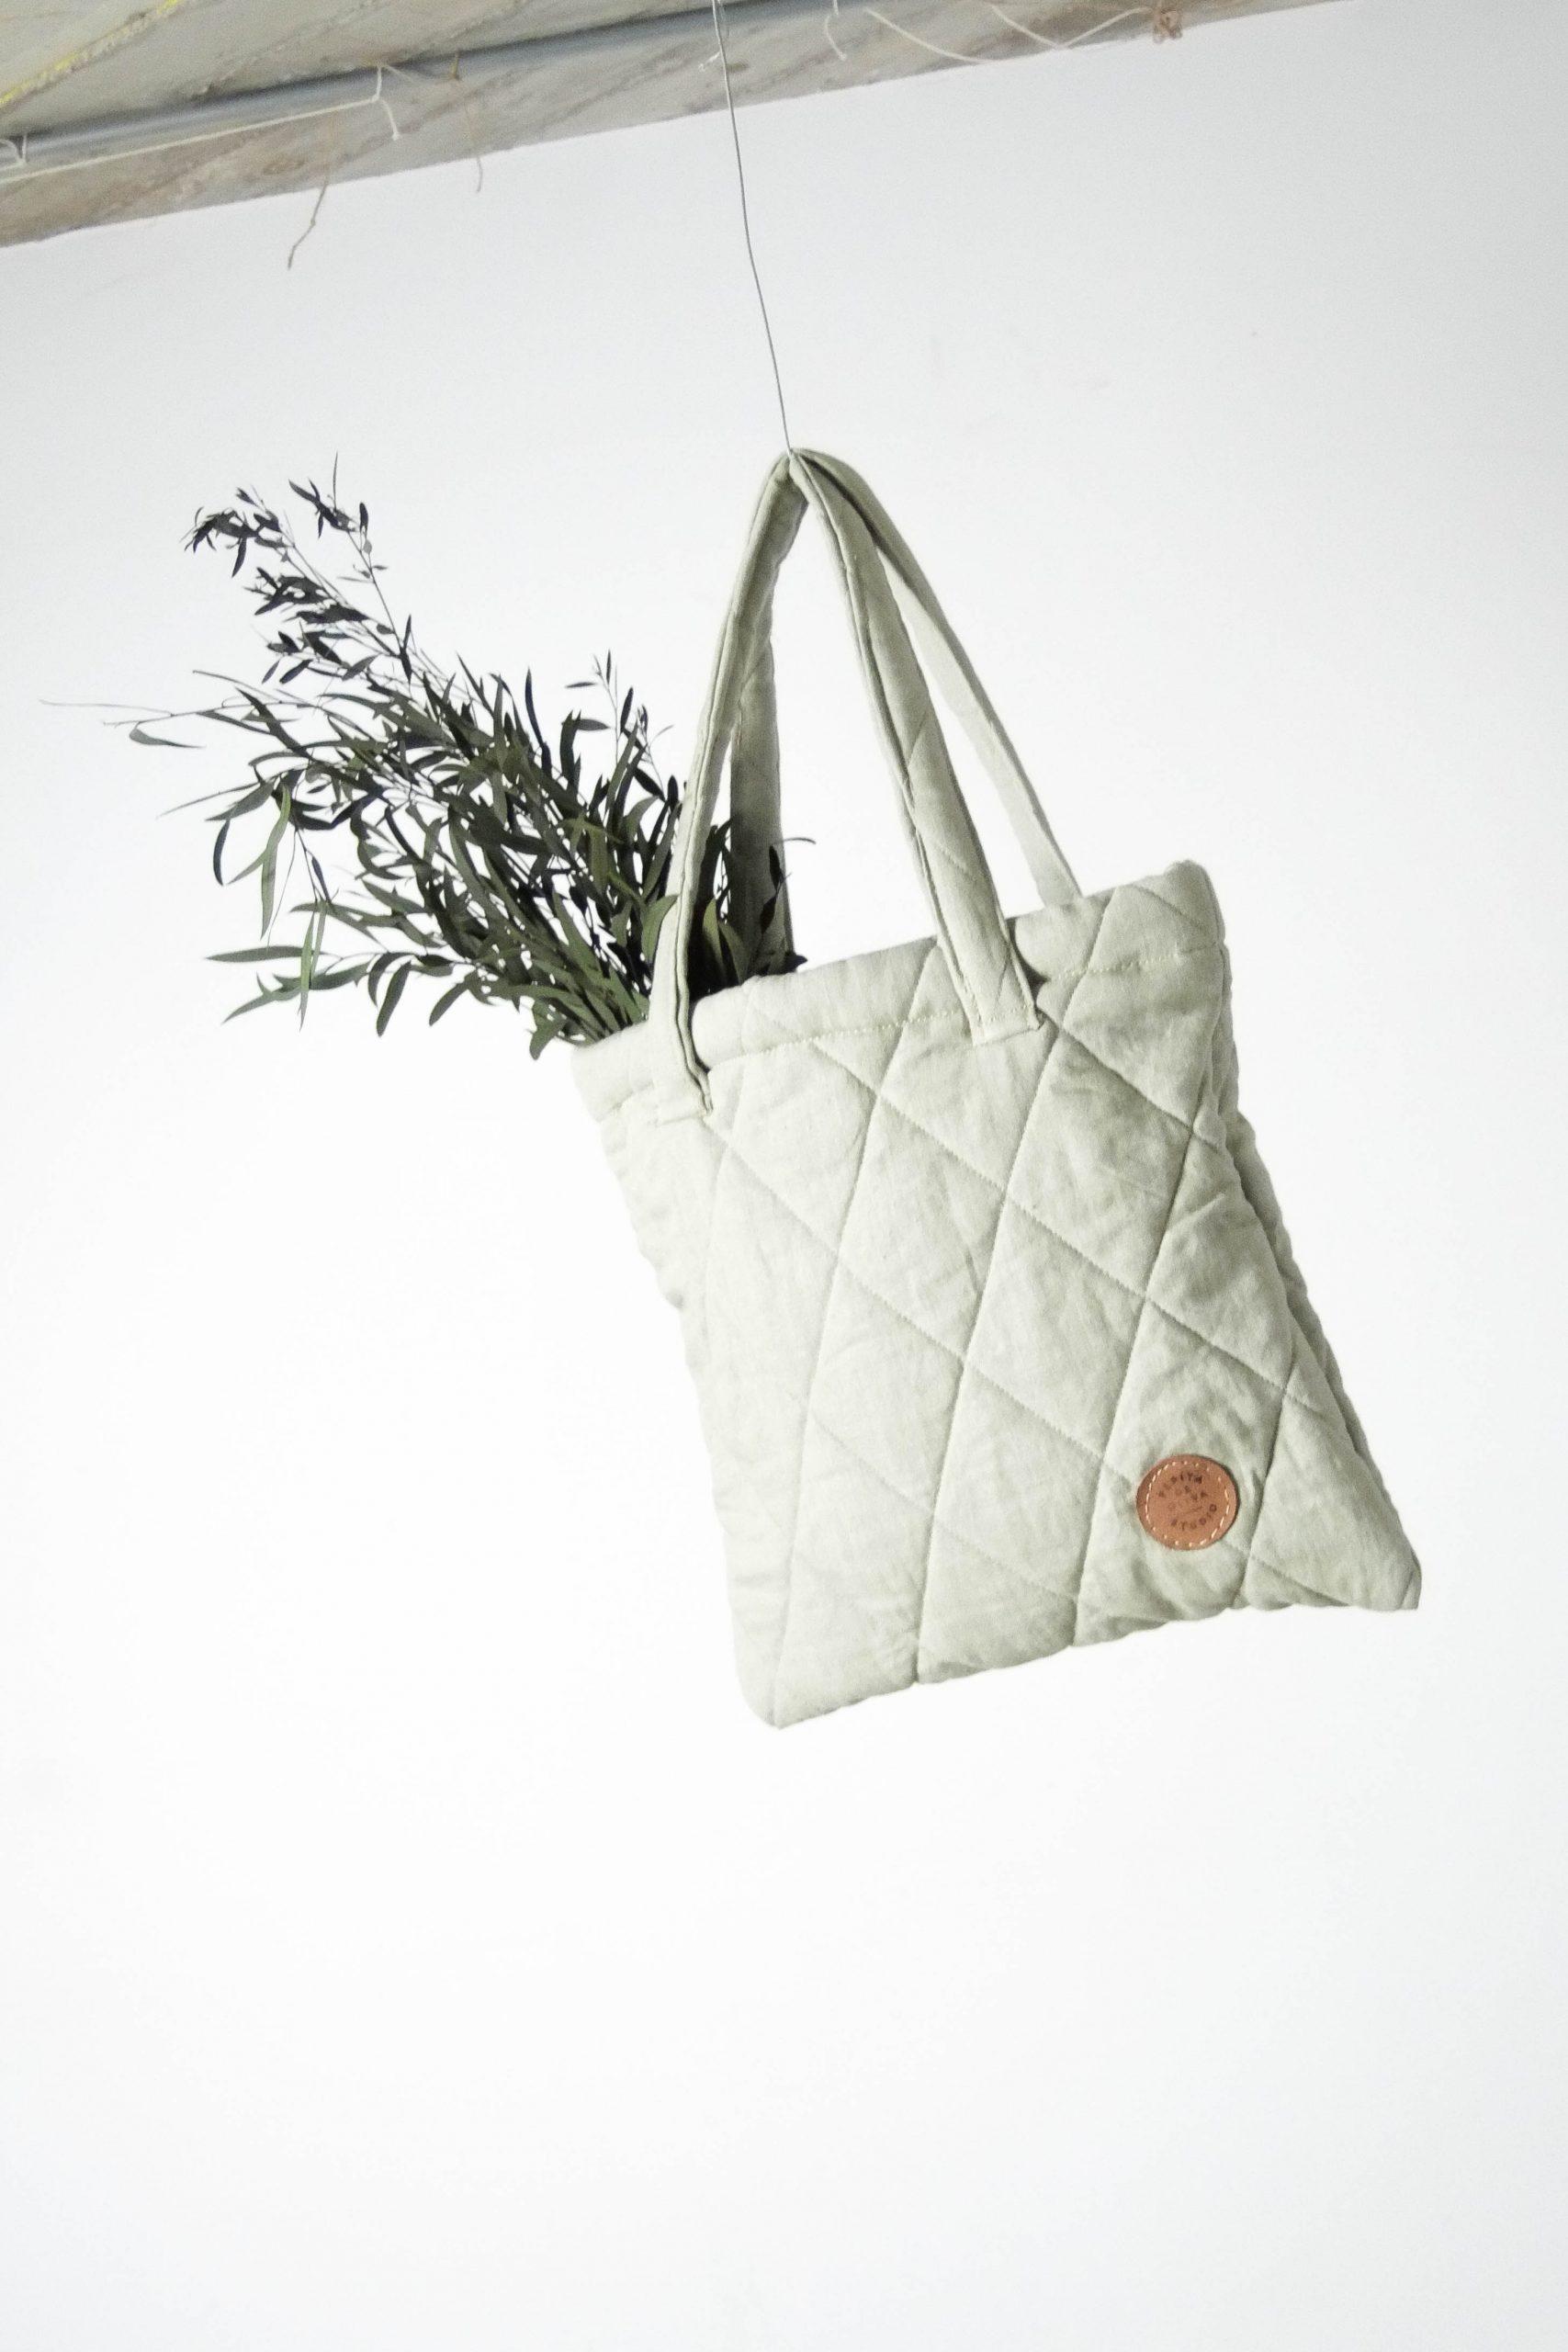 bolsa de diseño pepita de oliva de guata verde